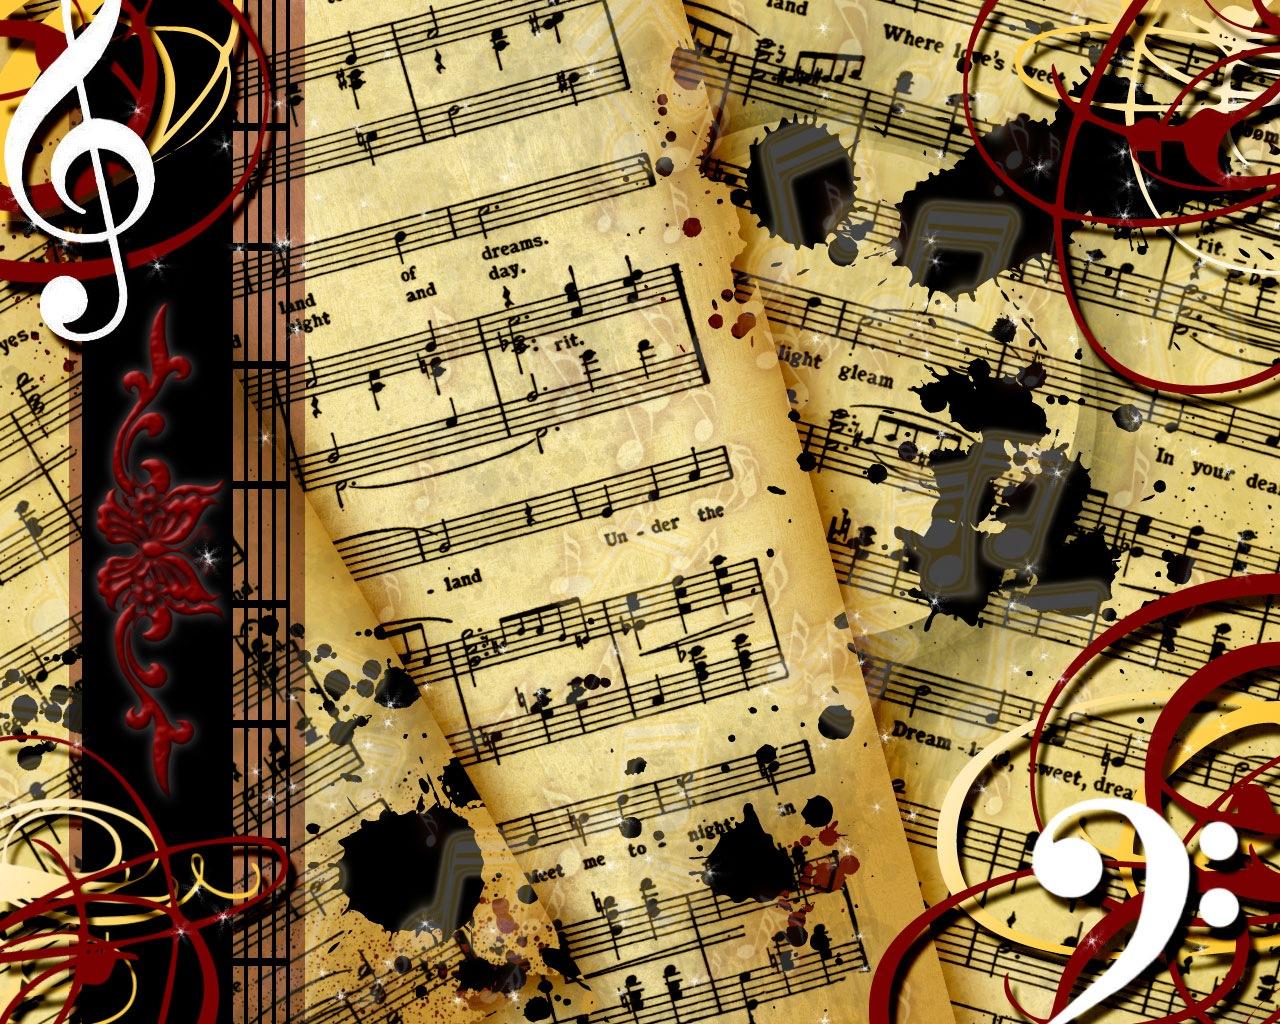 50 Music Wallpaper For Ipad On Wallpapersafari: Music Computer Backgrounds